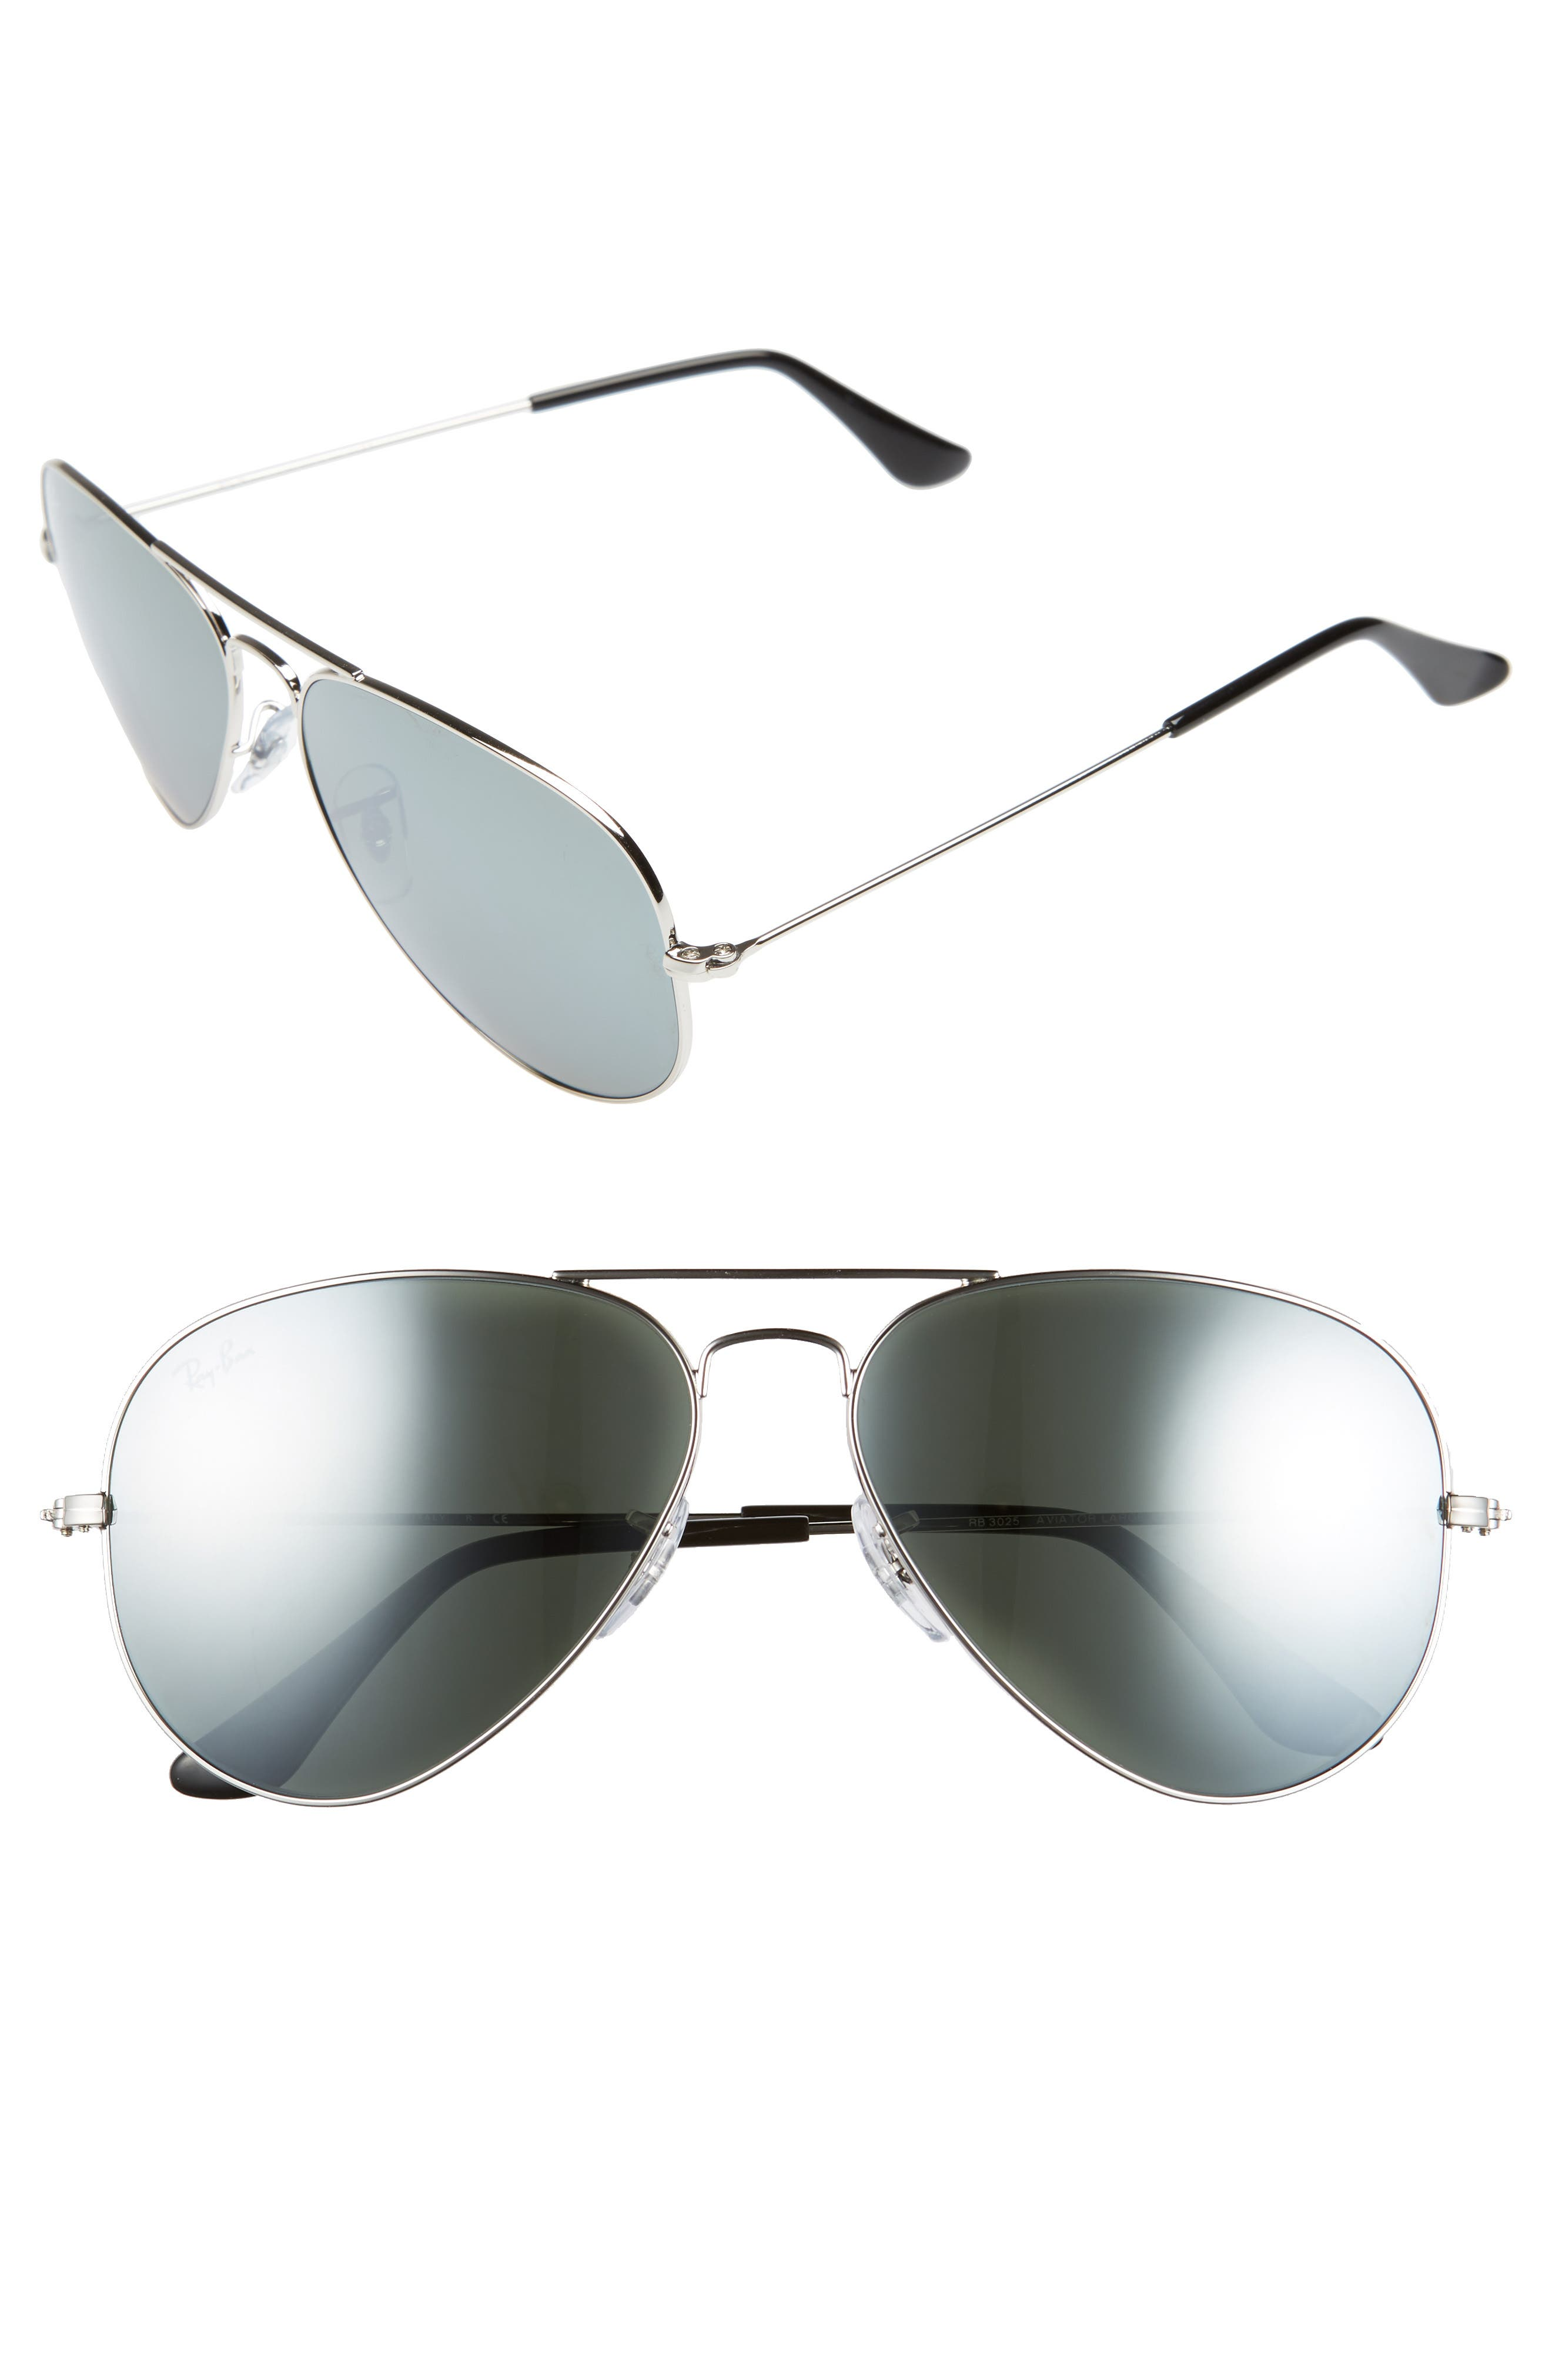 RAY-BAN Original Aviator 58mm Sunglasses, Main, color, SILVER/ GREY MIRROR